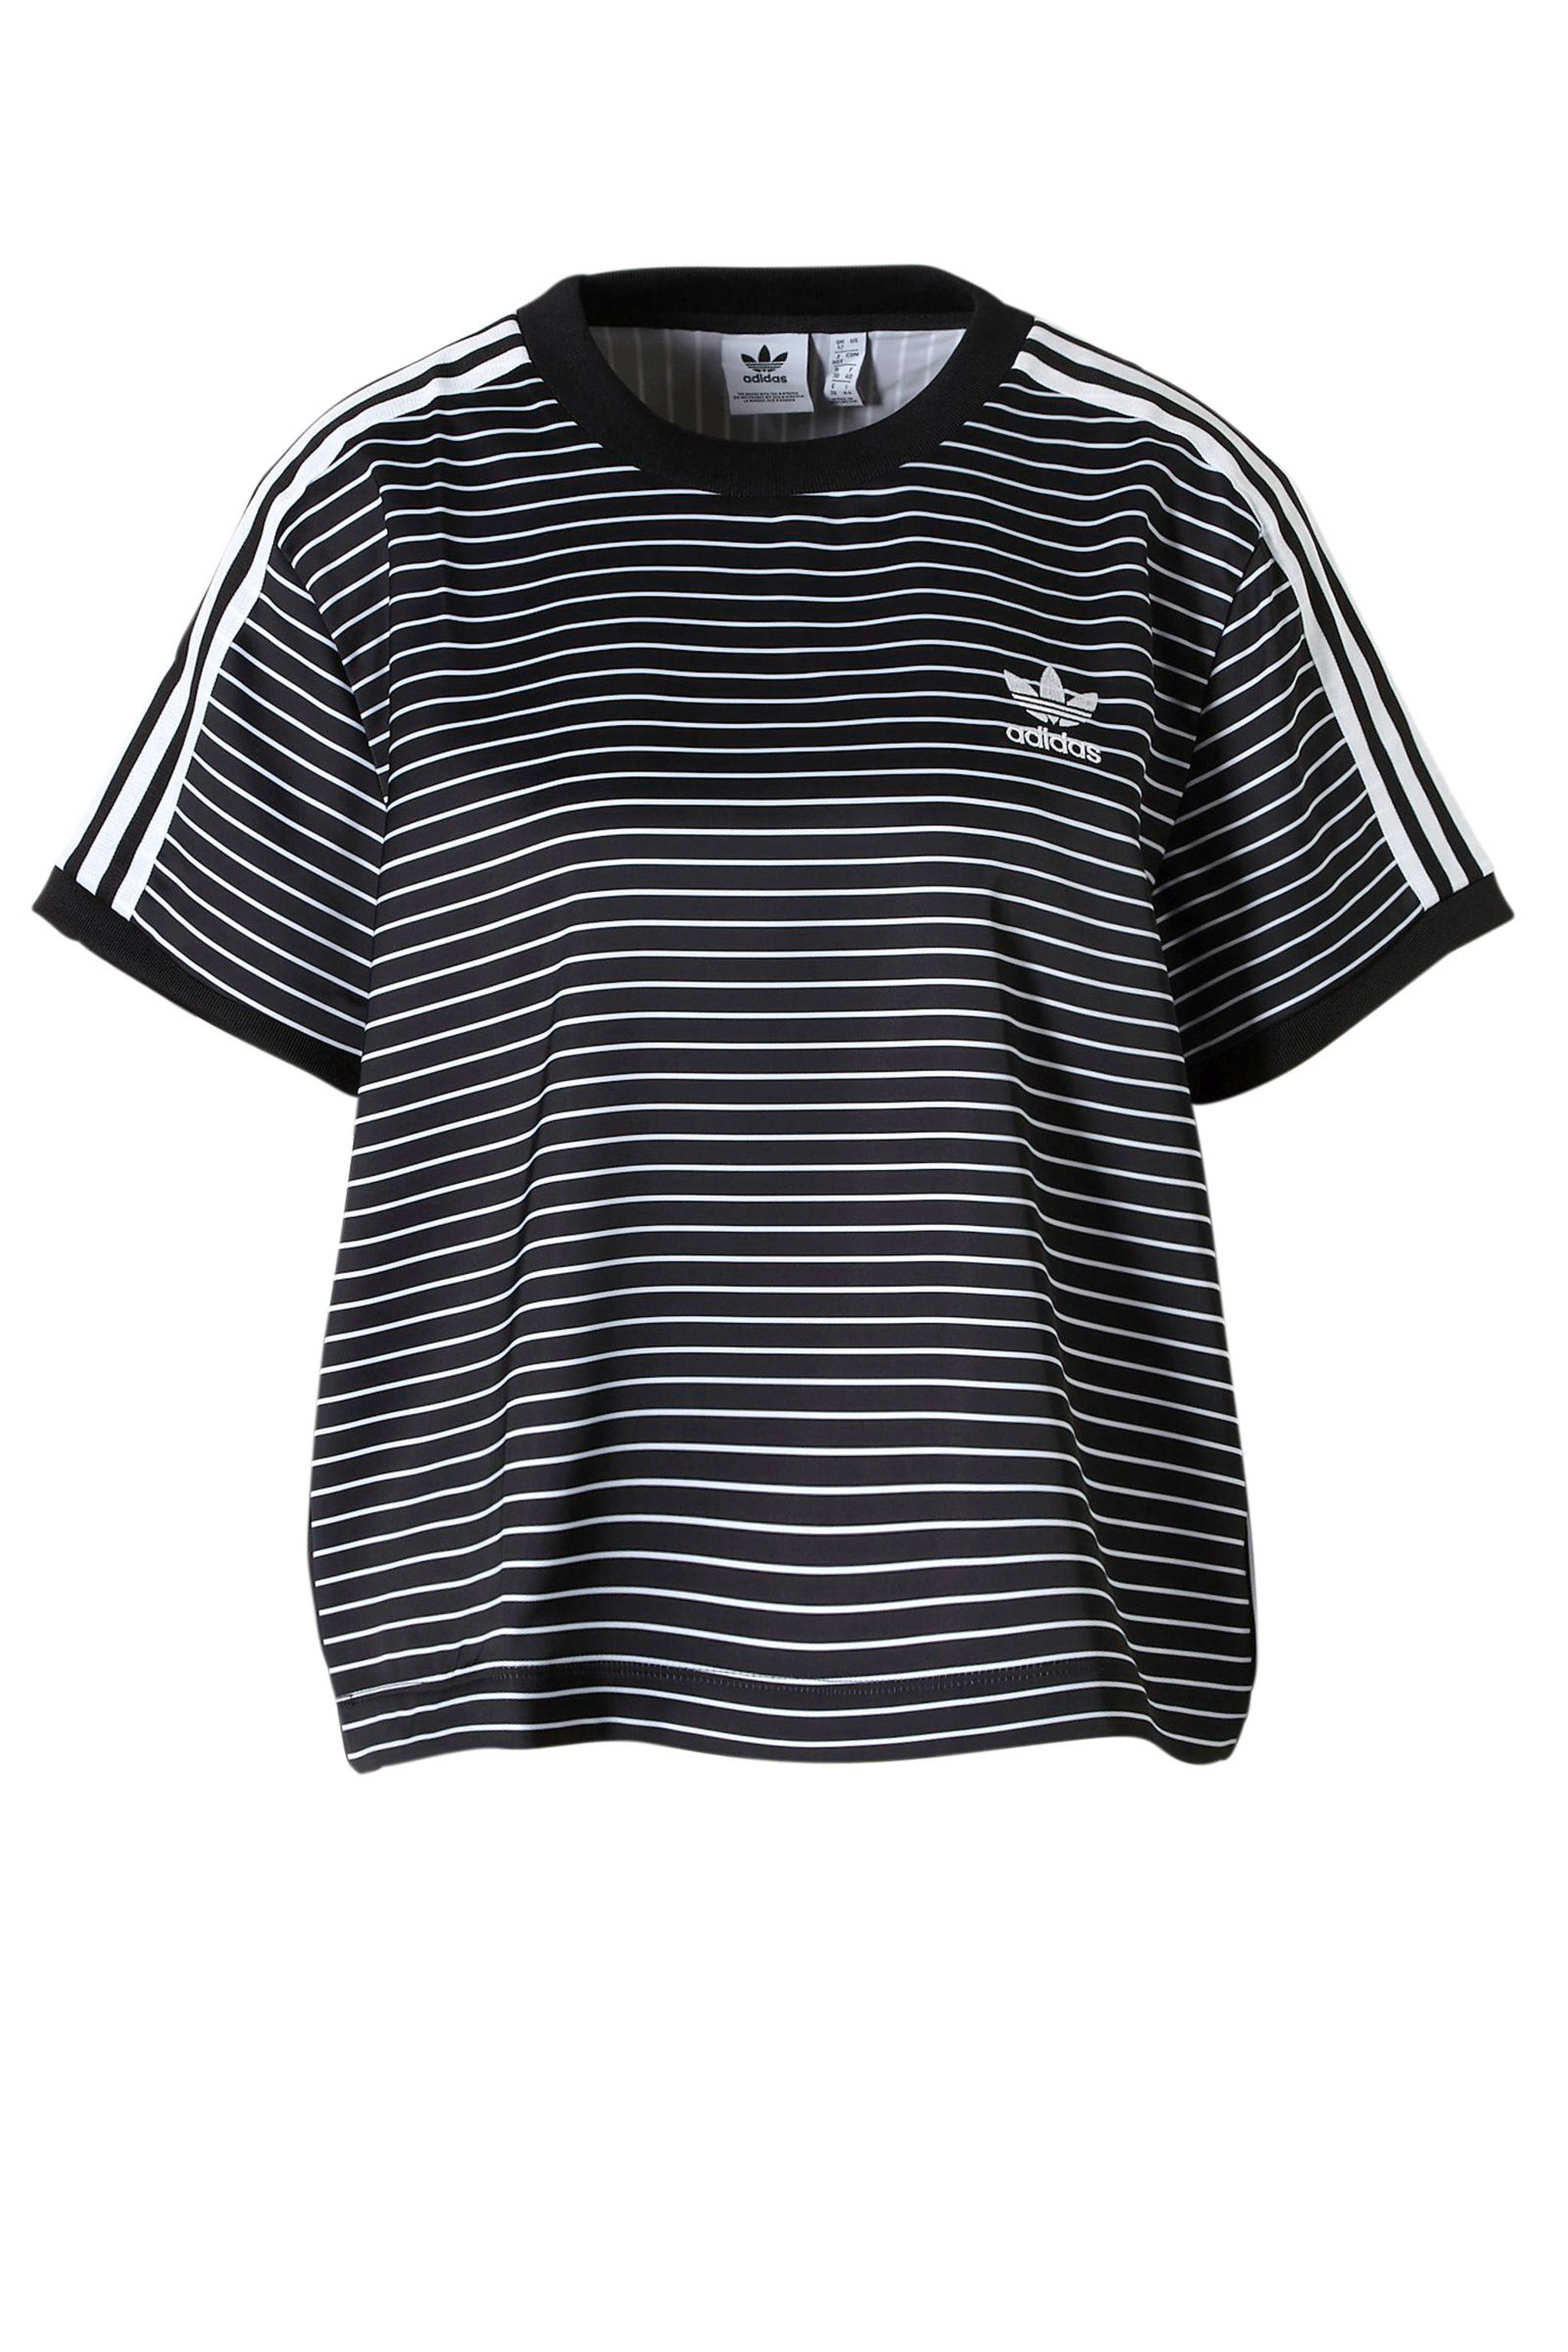 1a6a4c113ca adidas originals originals T-shirt met strepen zwart/wit | wehkamp